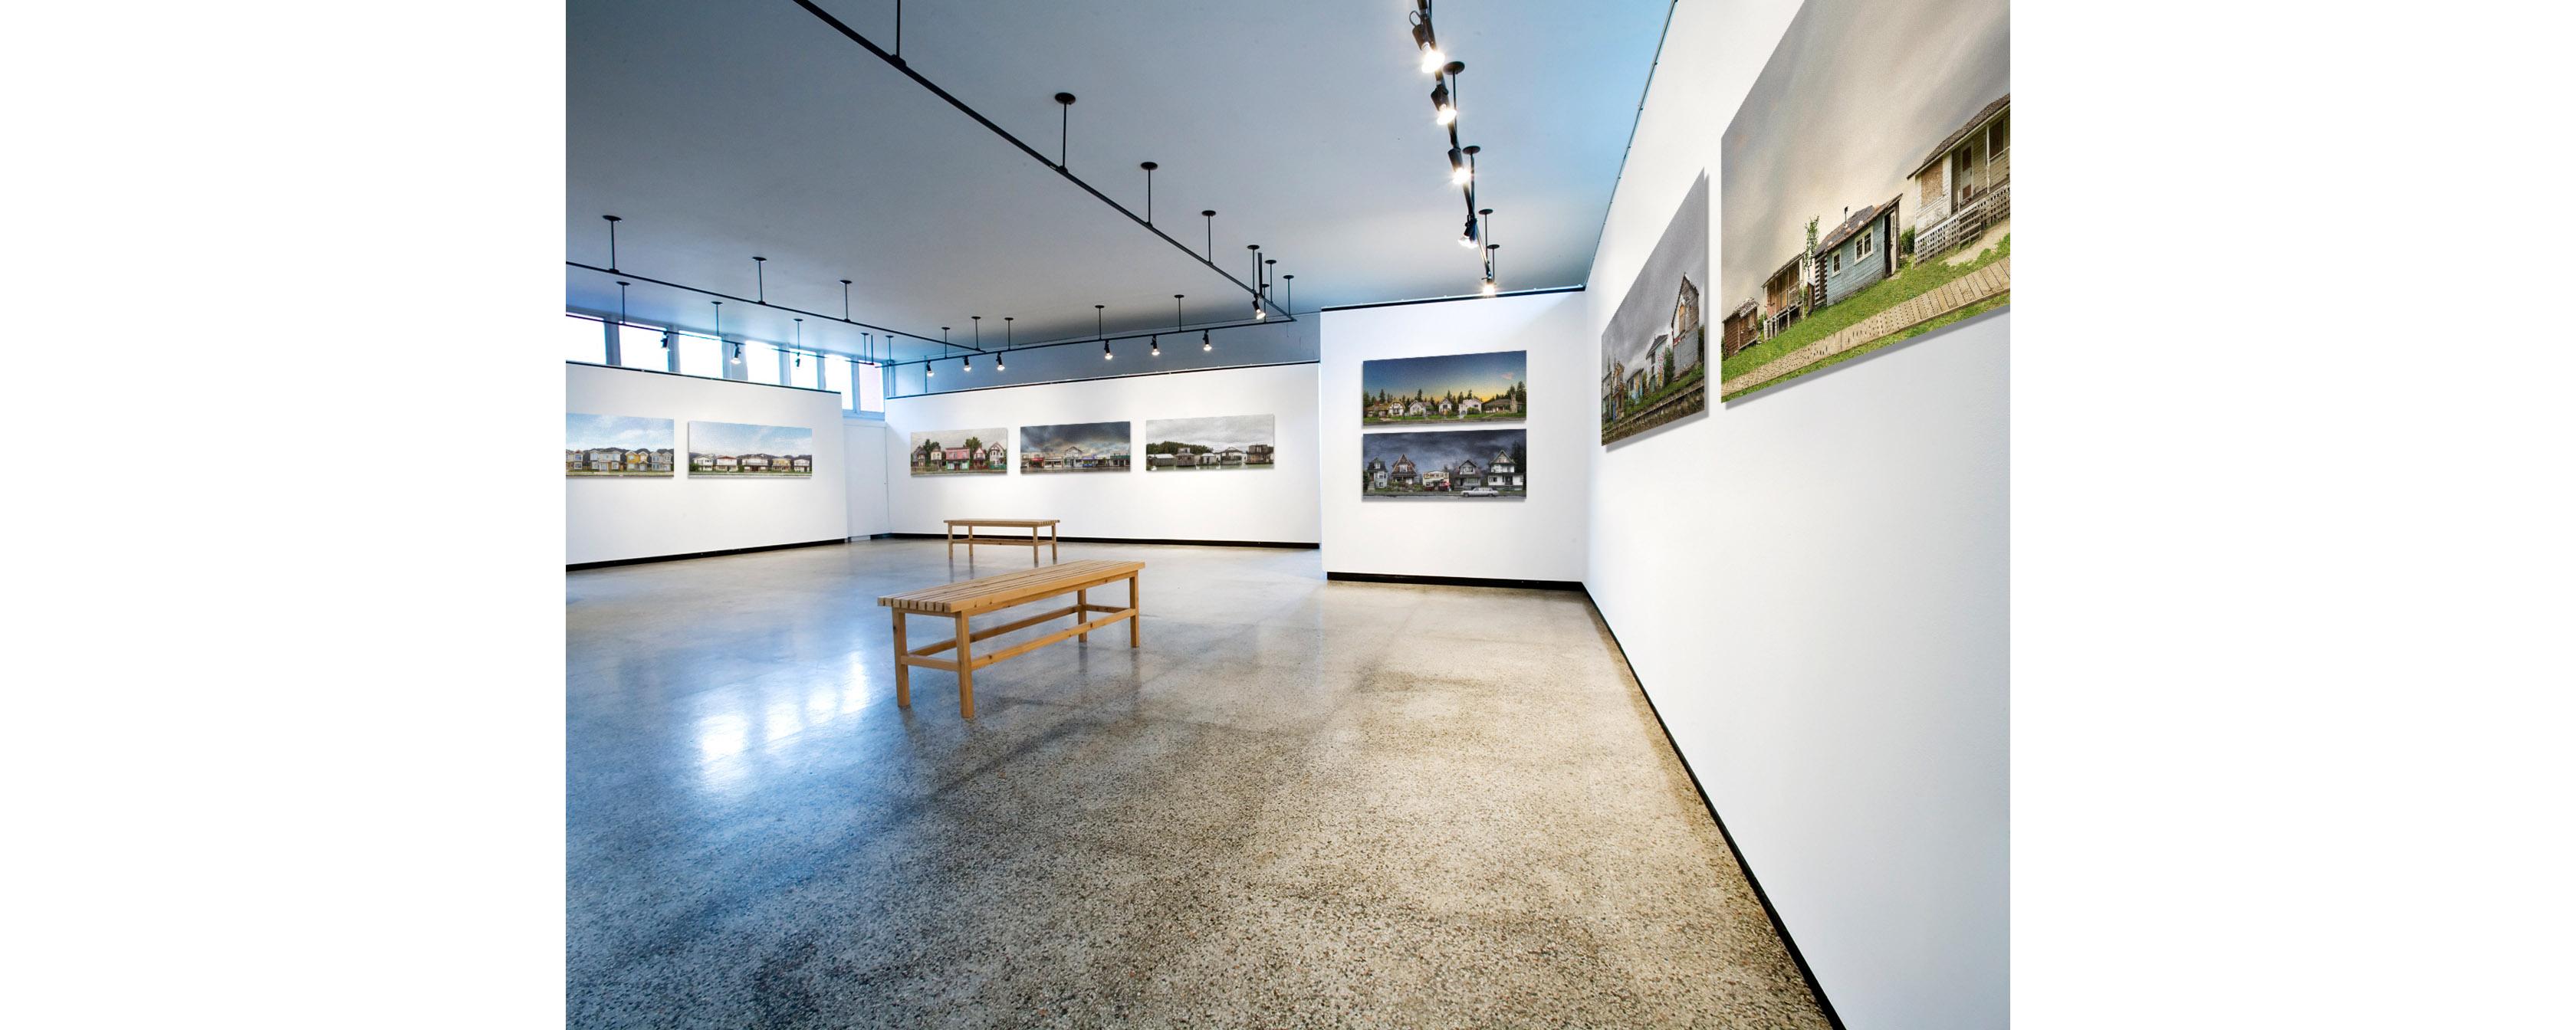 18″ x 45″ prints, in installation